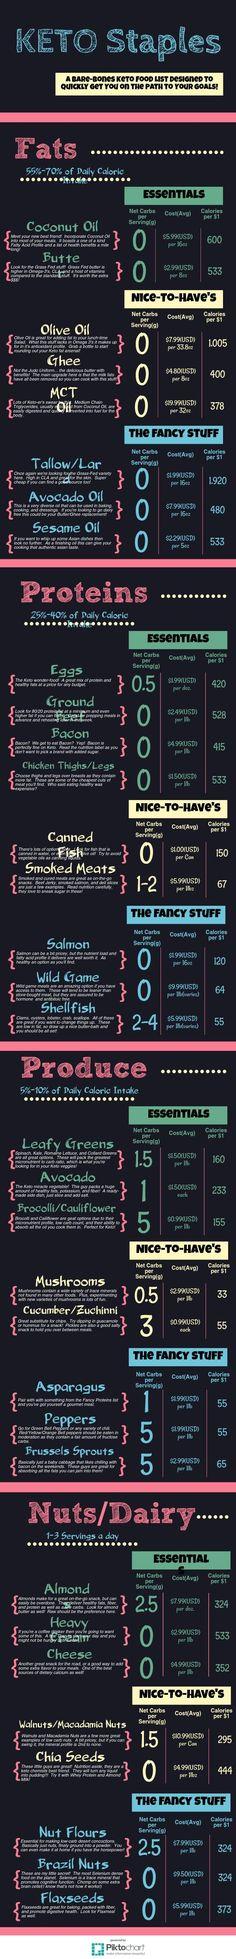 Keto Diet Shopping List | Piktochart Visual Editor